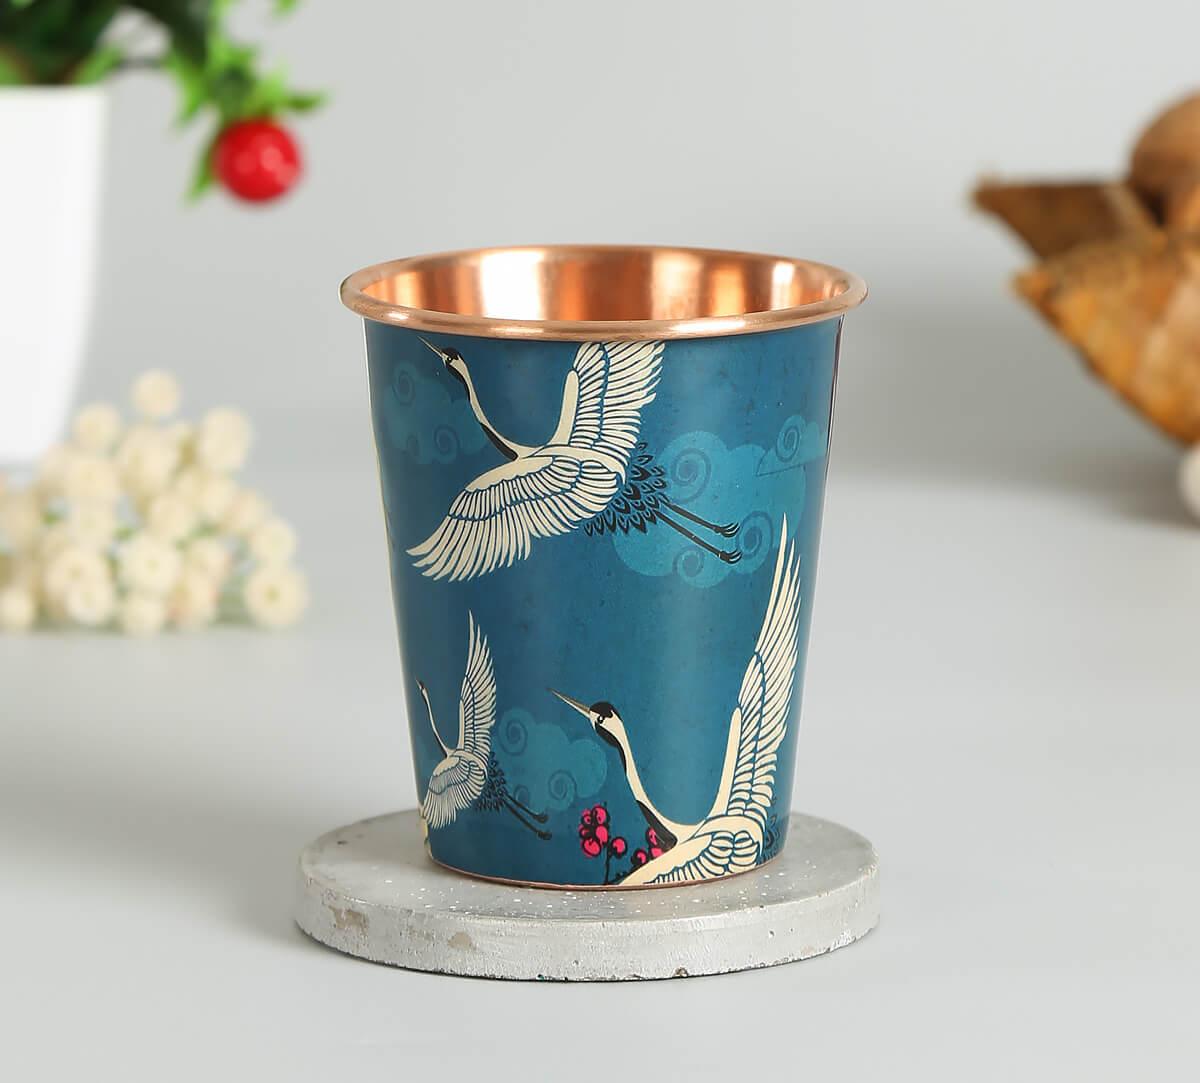 Legend of the Cranes Copper Tumbler Small